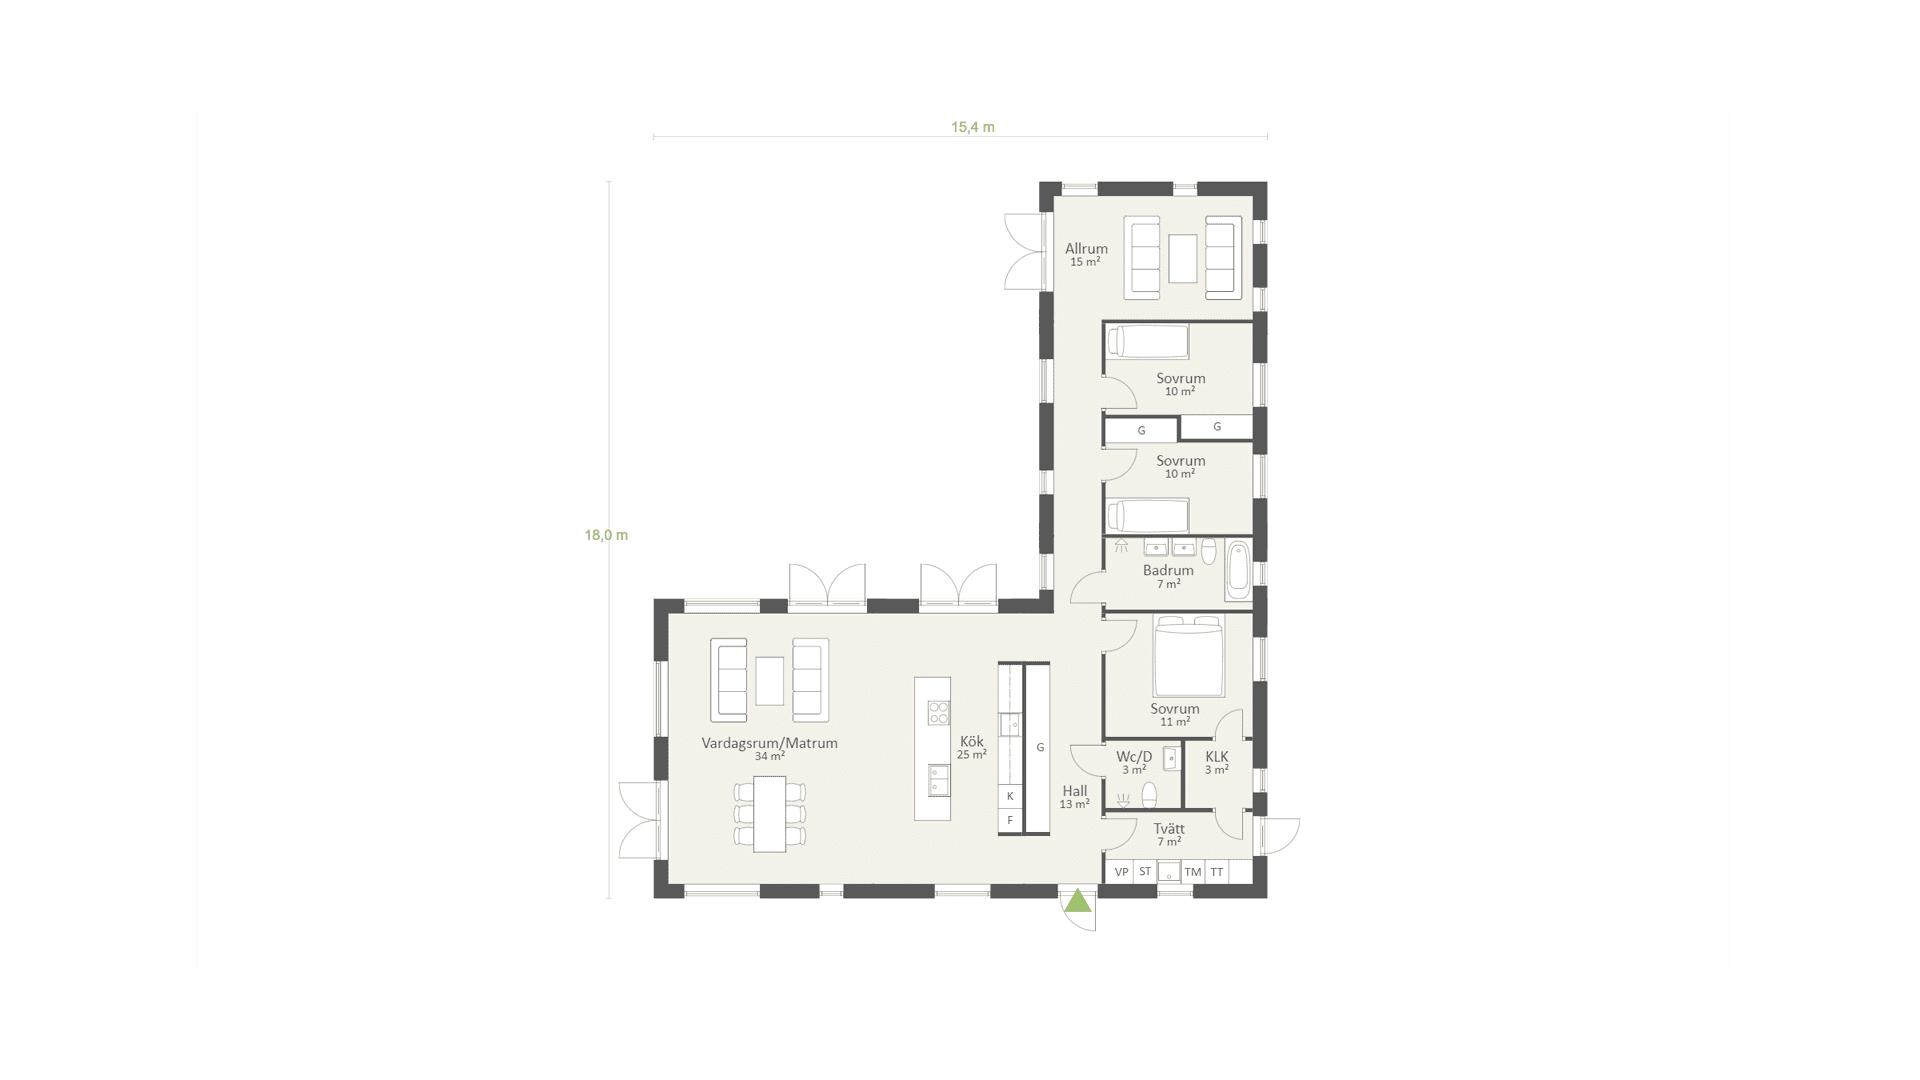 Funkishus Enplanshus-153kvm-3sovrum-Planlösning-AChoice-stenhus